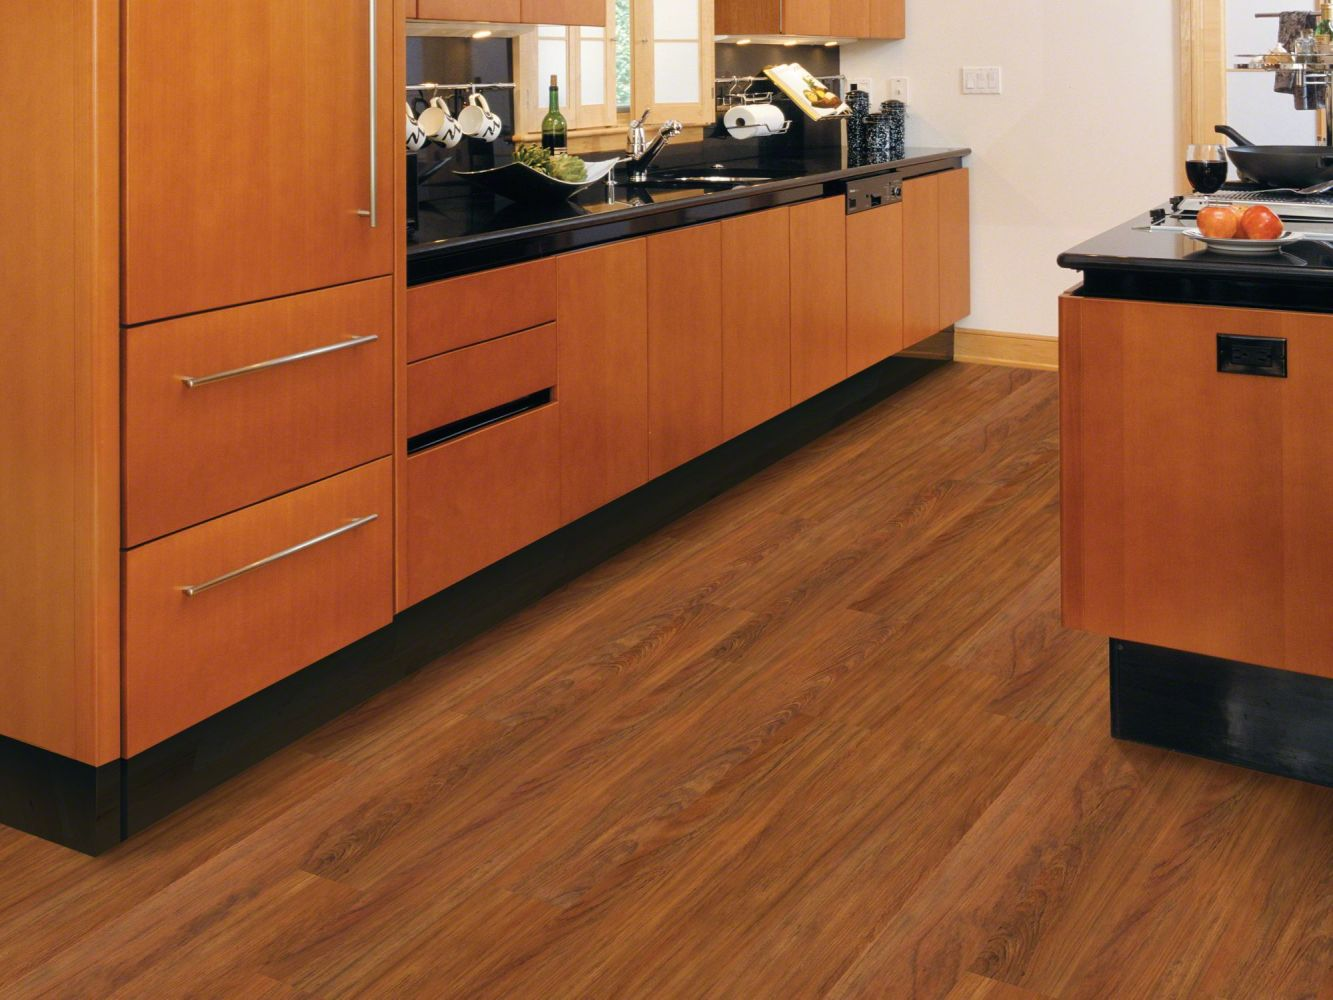 Shaw Floors Nfa HS Take It Easy Emberglow 00681_VH509